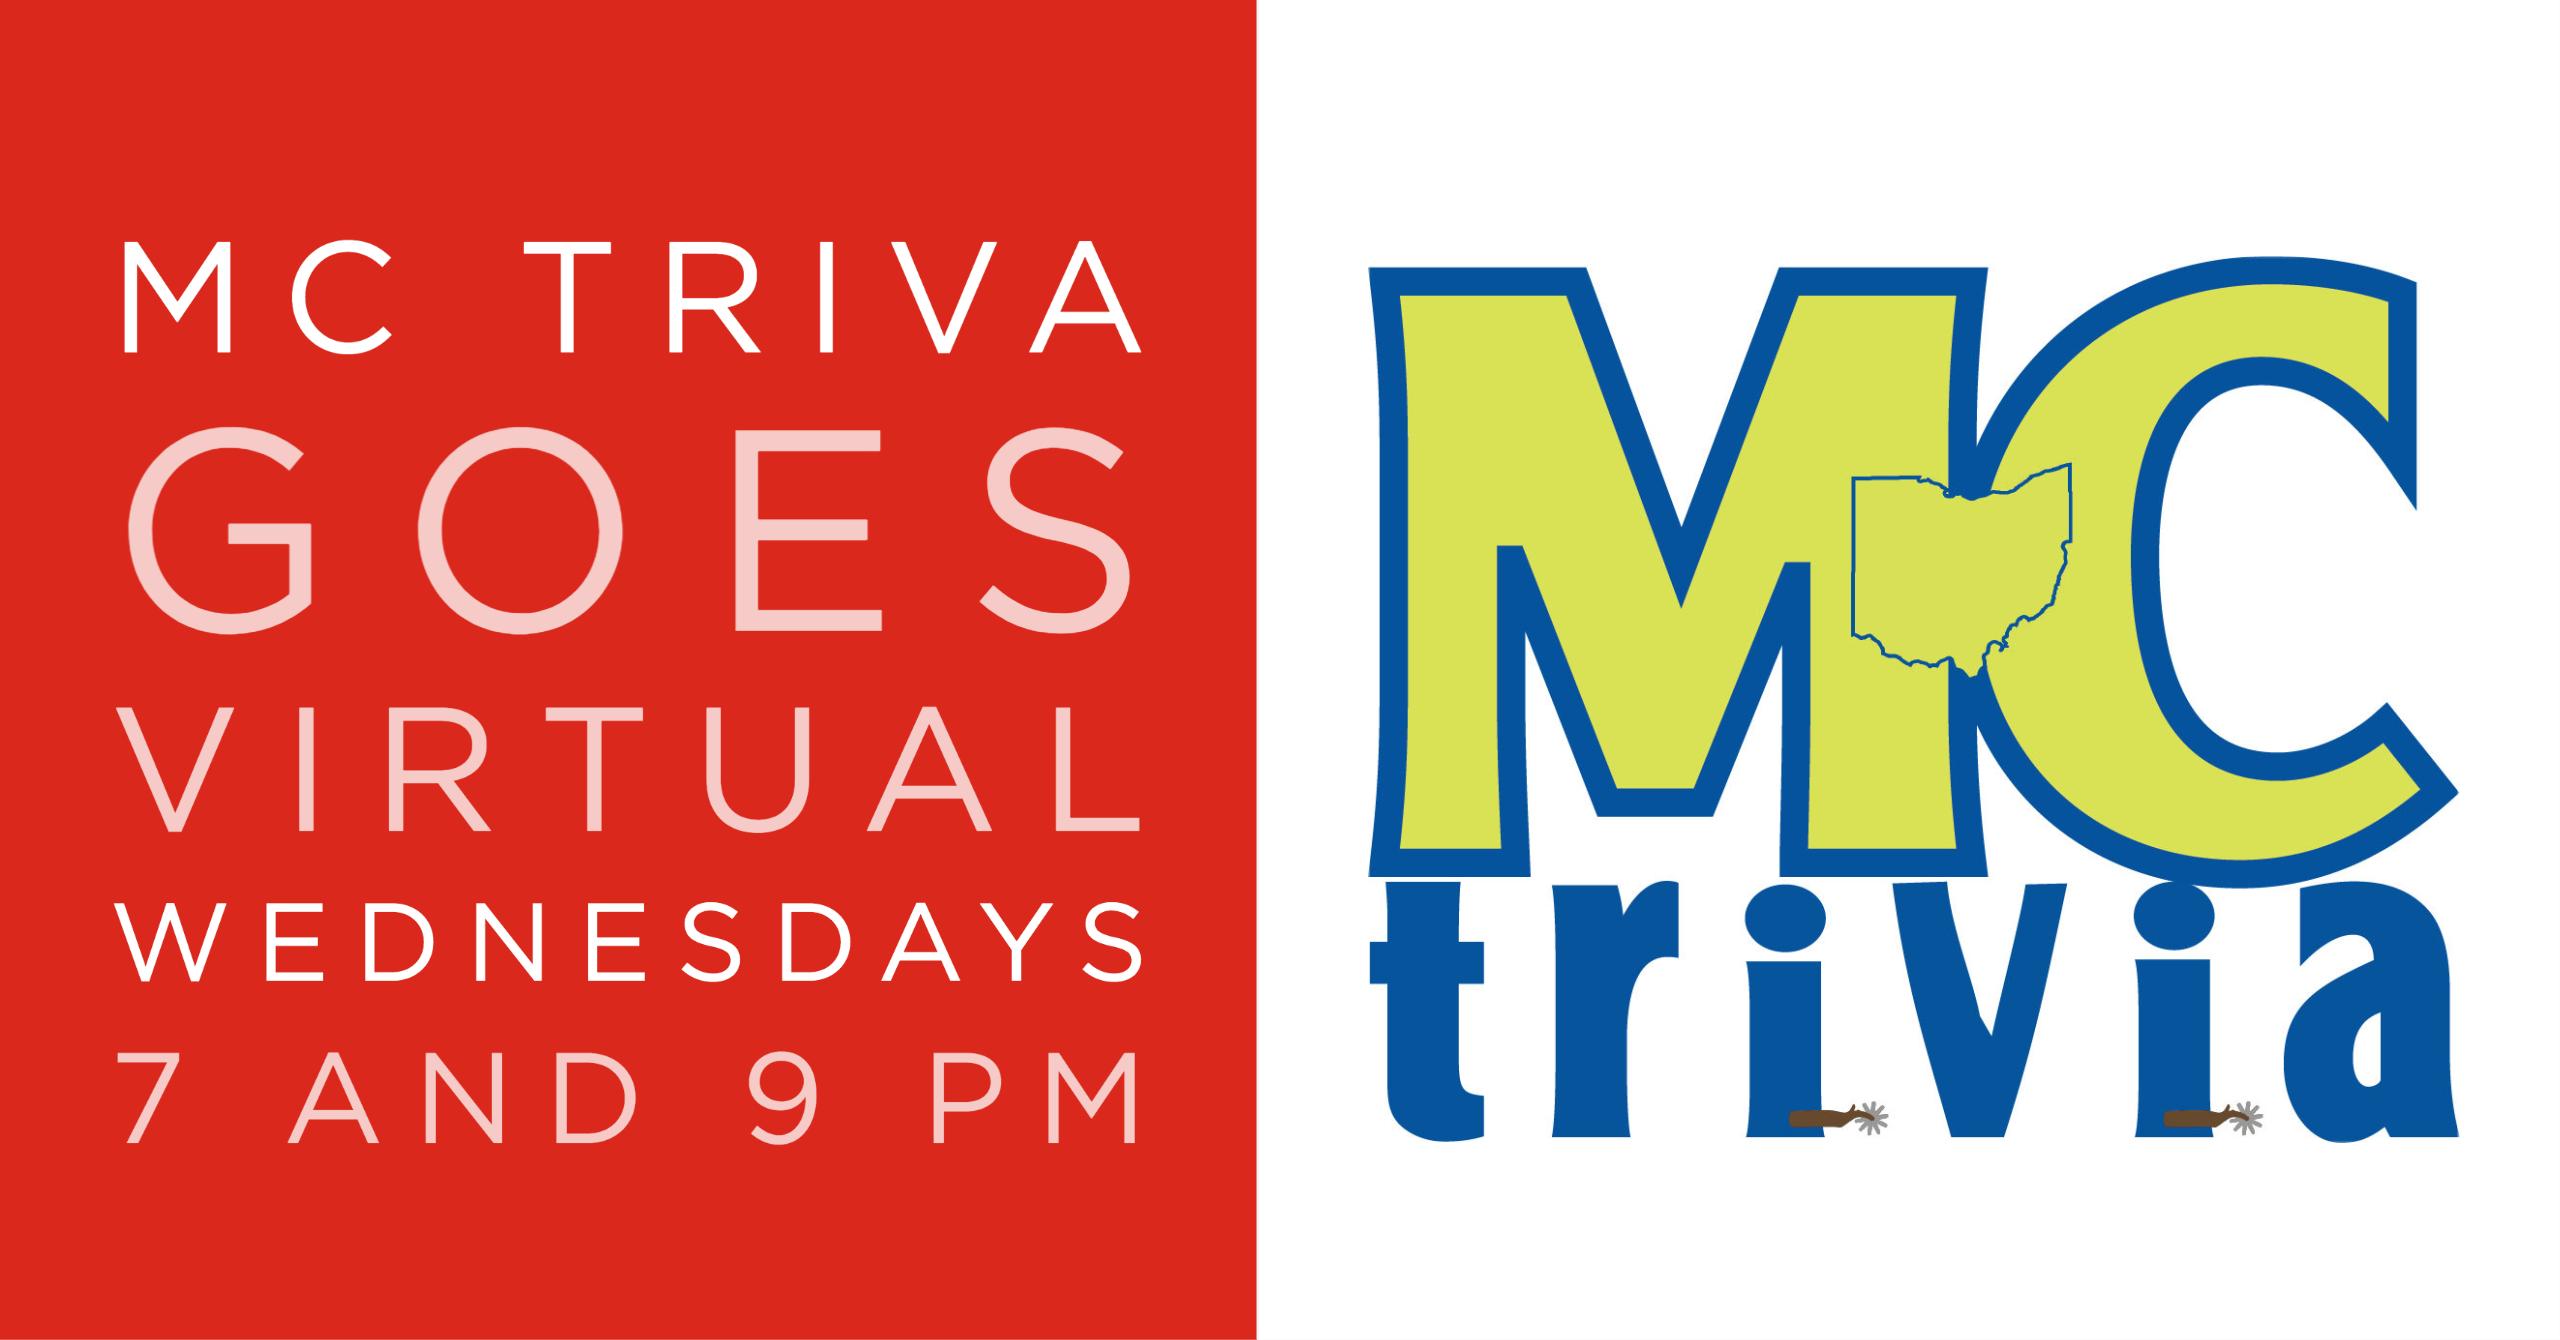 MC Trivia Goes Virtual